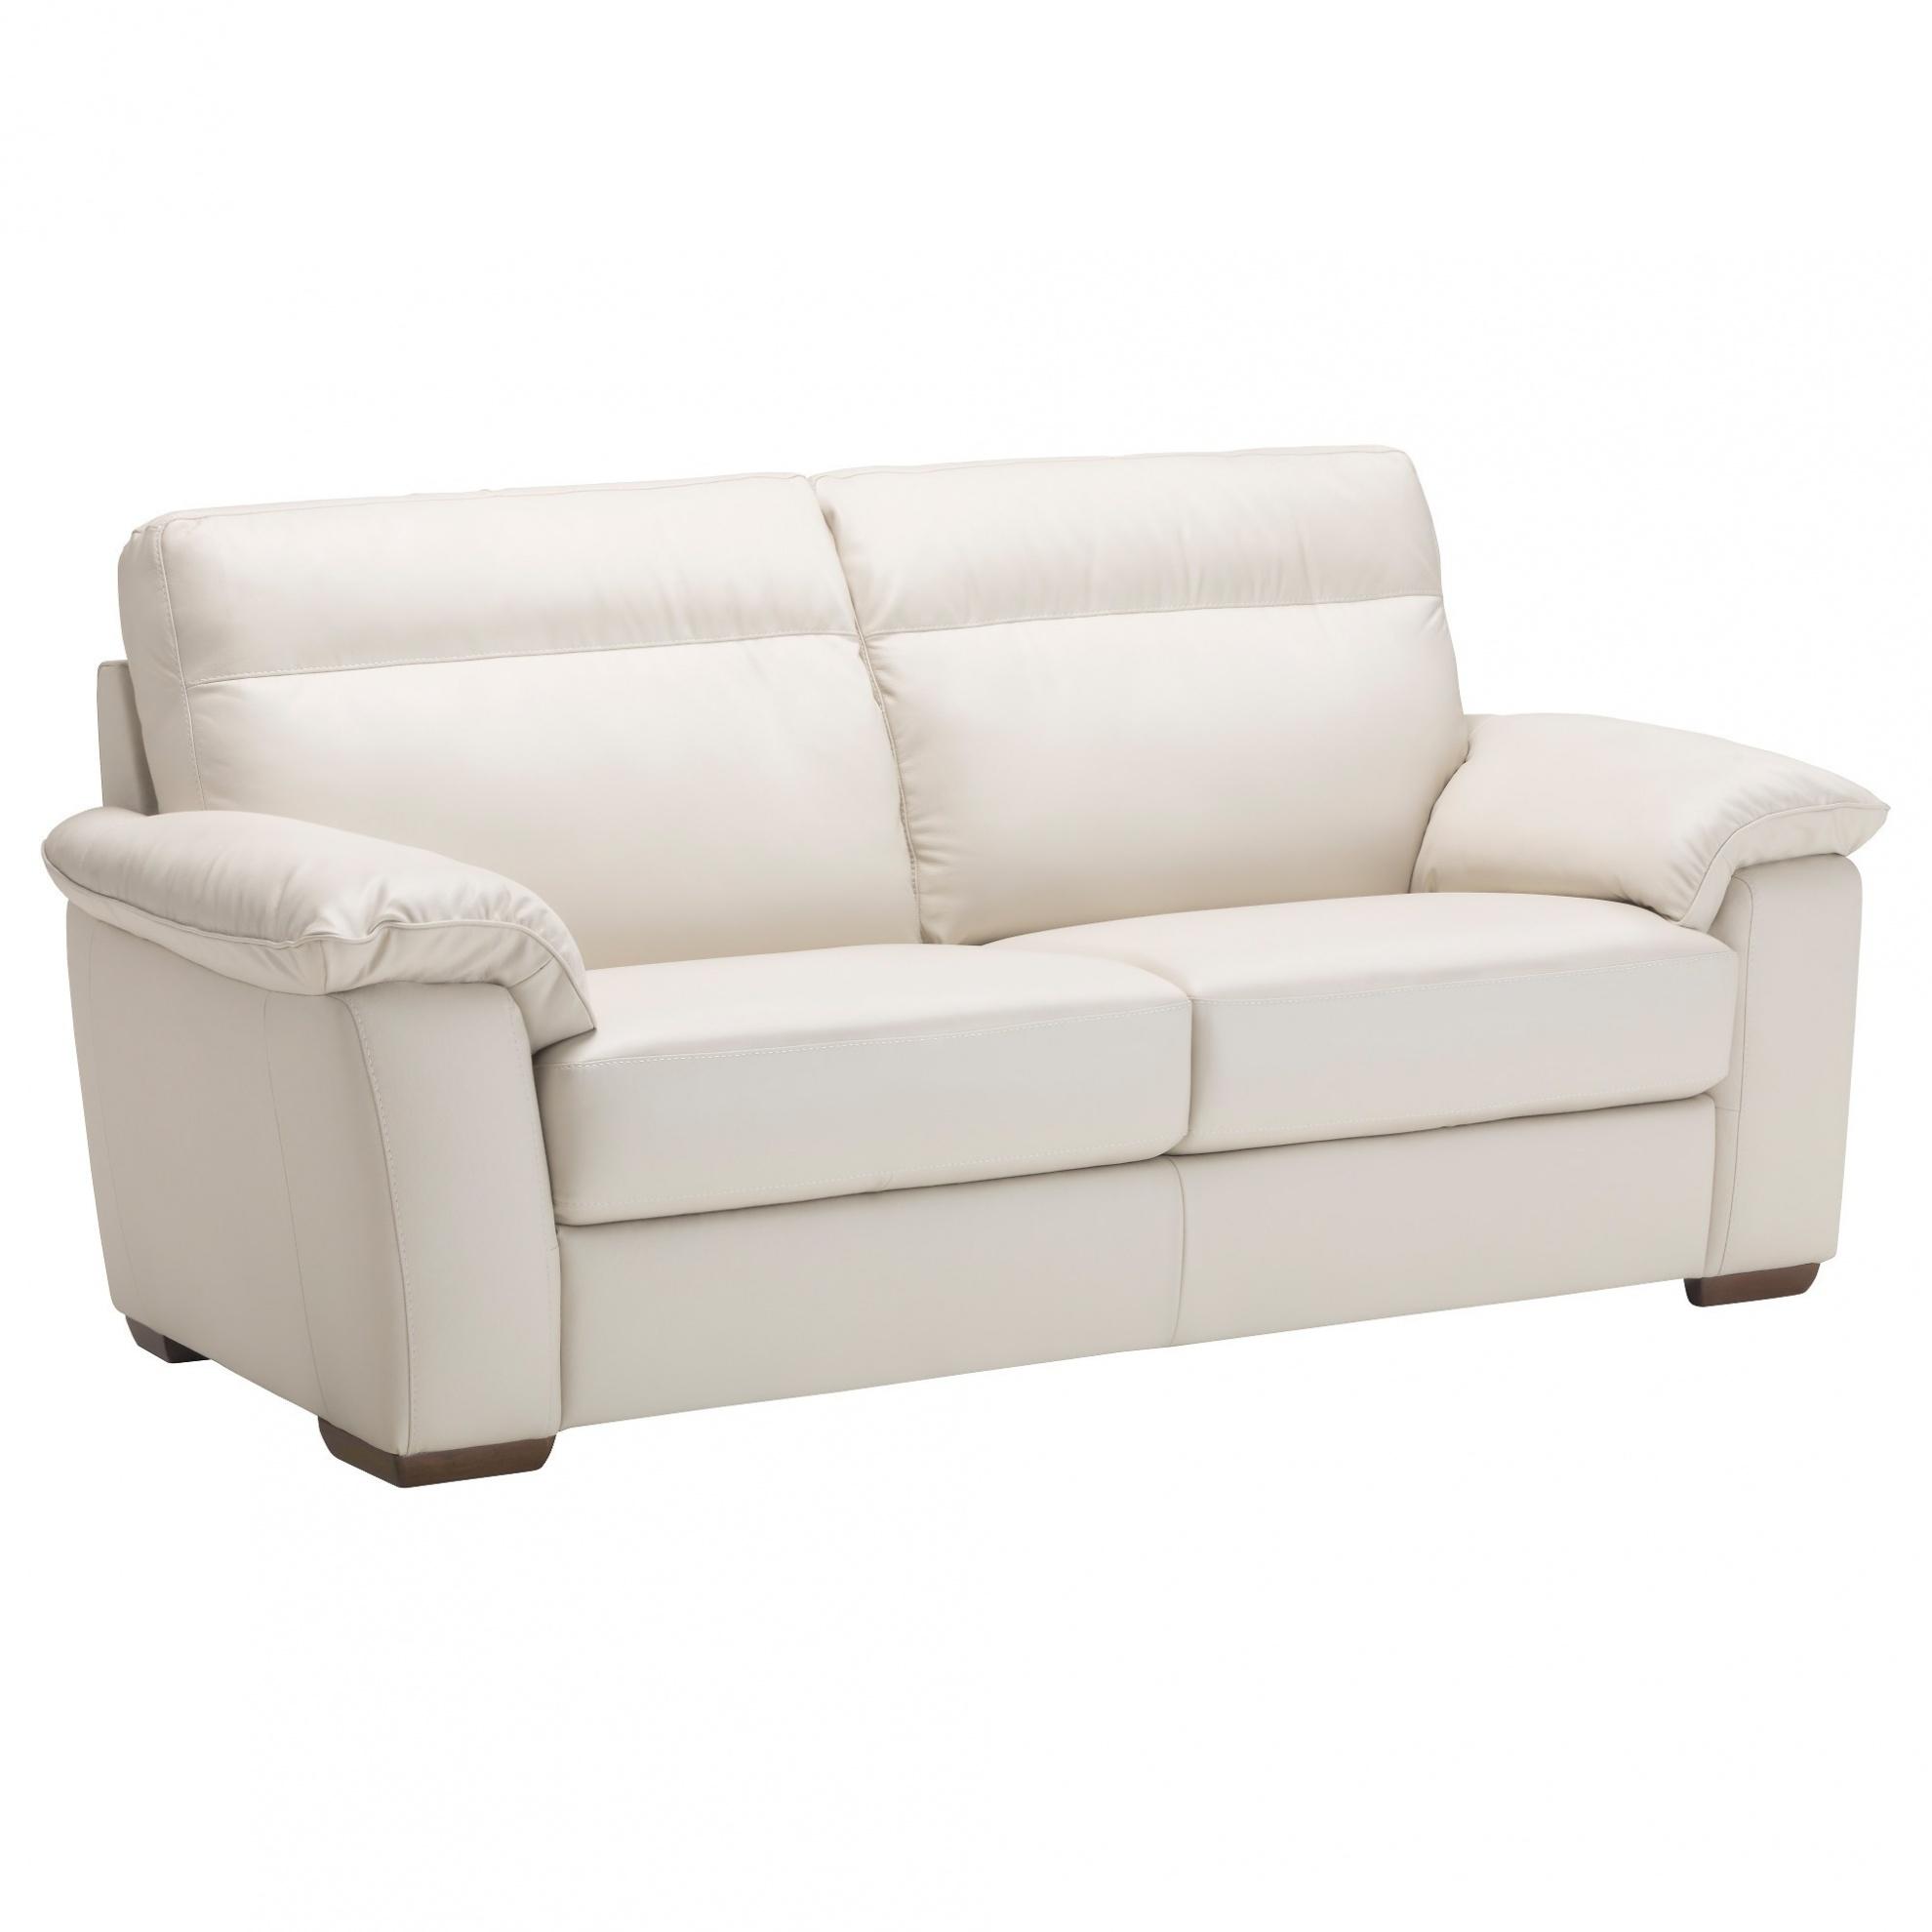 Canapé En Cuir Ikea Frais Stock Maha S Canapé Tissu 3 Places Home Mahagranda